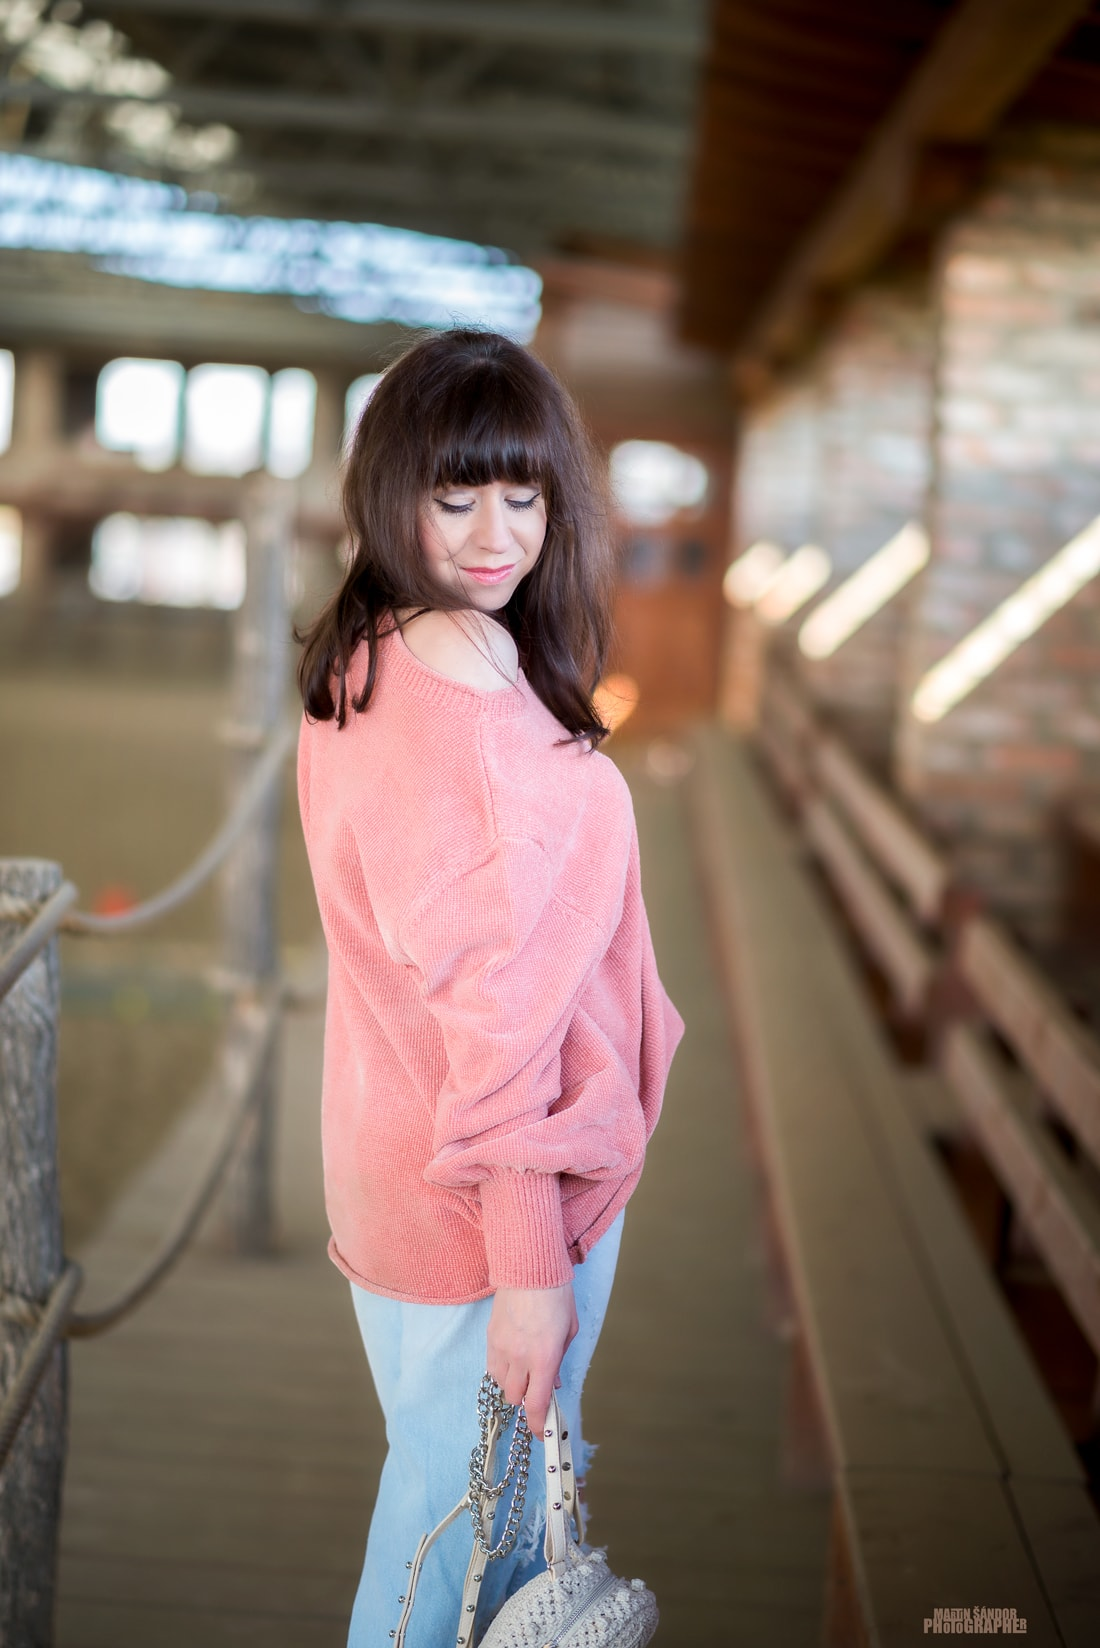 SPOMIENKA NA SVETER VĎAKA ZARE_Katharine-fashion is beautiful_Blog 4_Ženilkový sveter zo Zary_Vyšívané džínsy_Tenisky s mašľou_Katarína Jakubčová_Fashion blogger